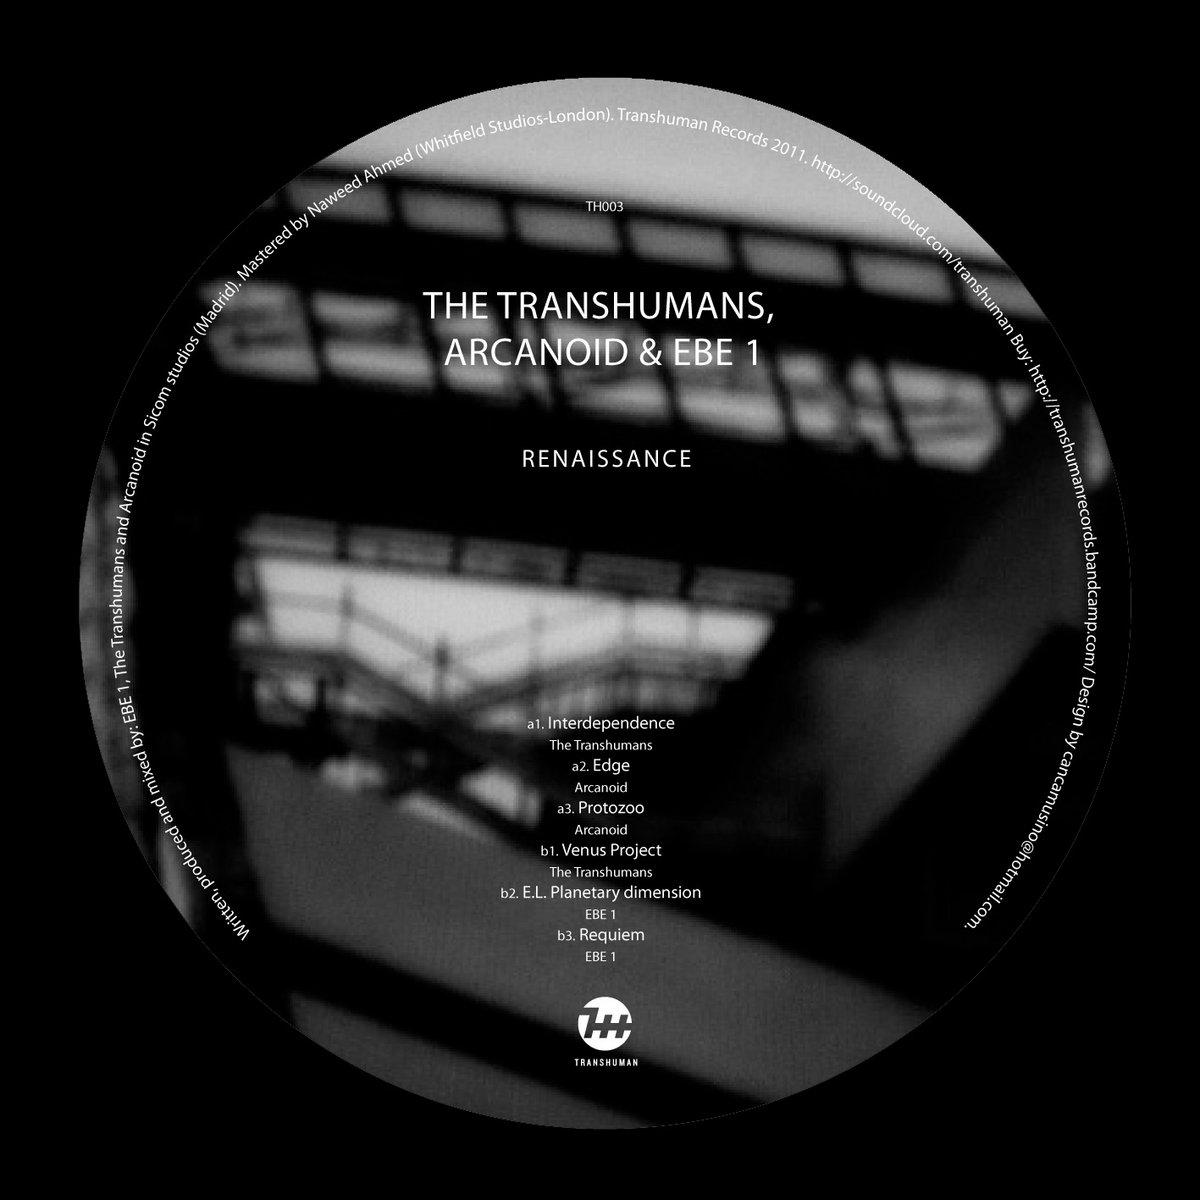 Renaissance | TRANSHUMAN RECORDS